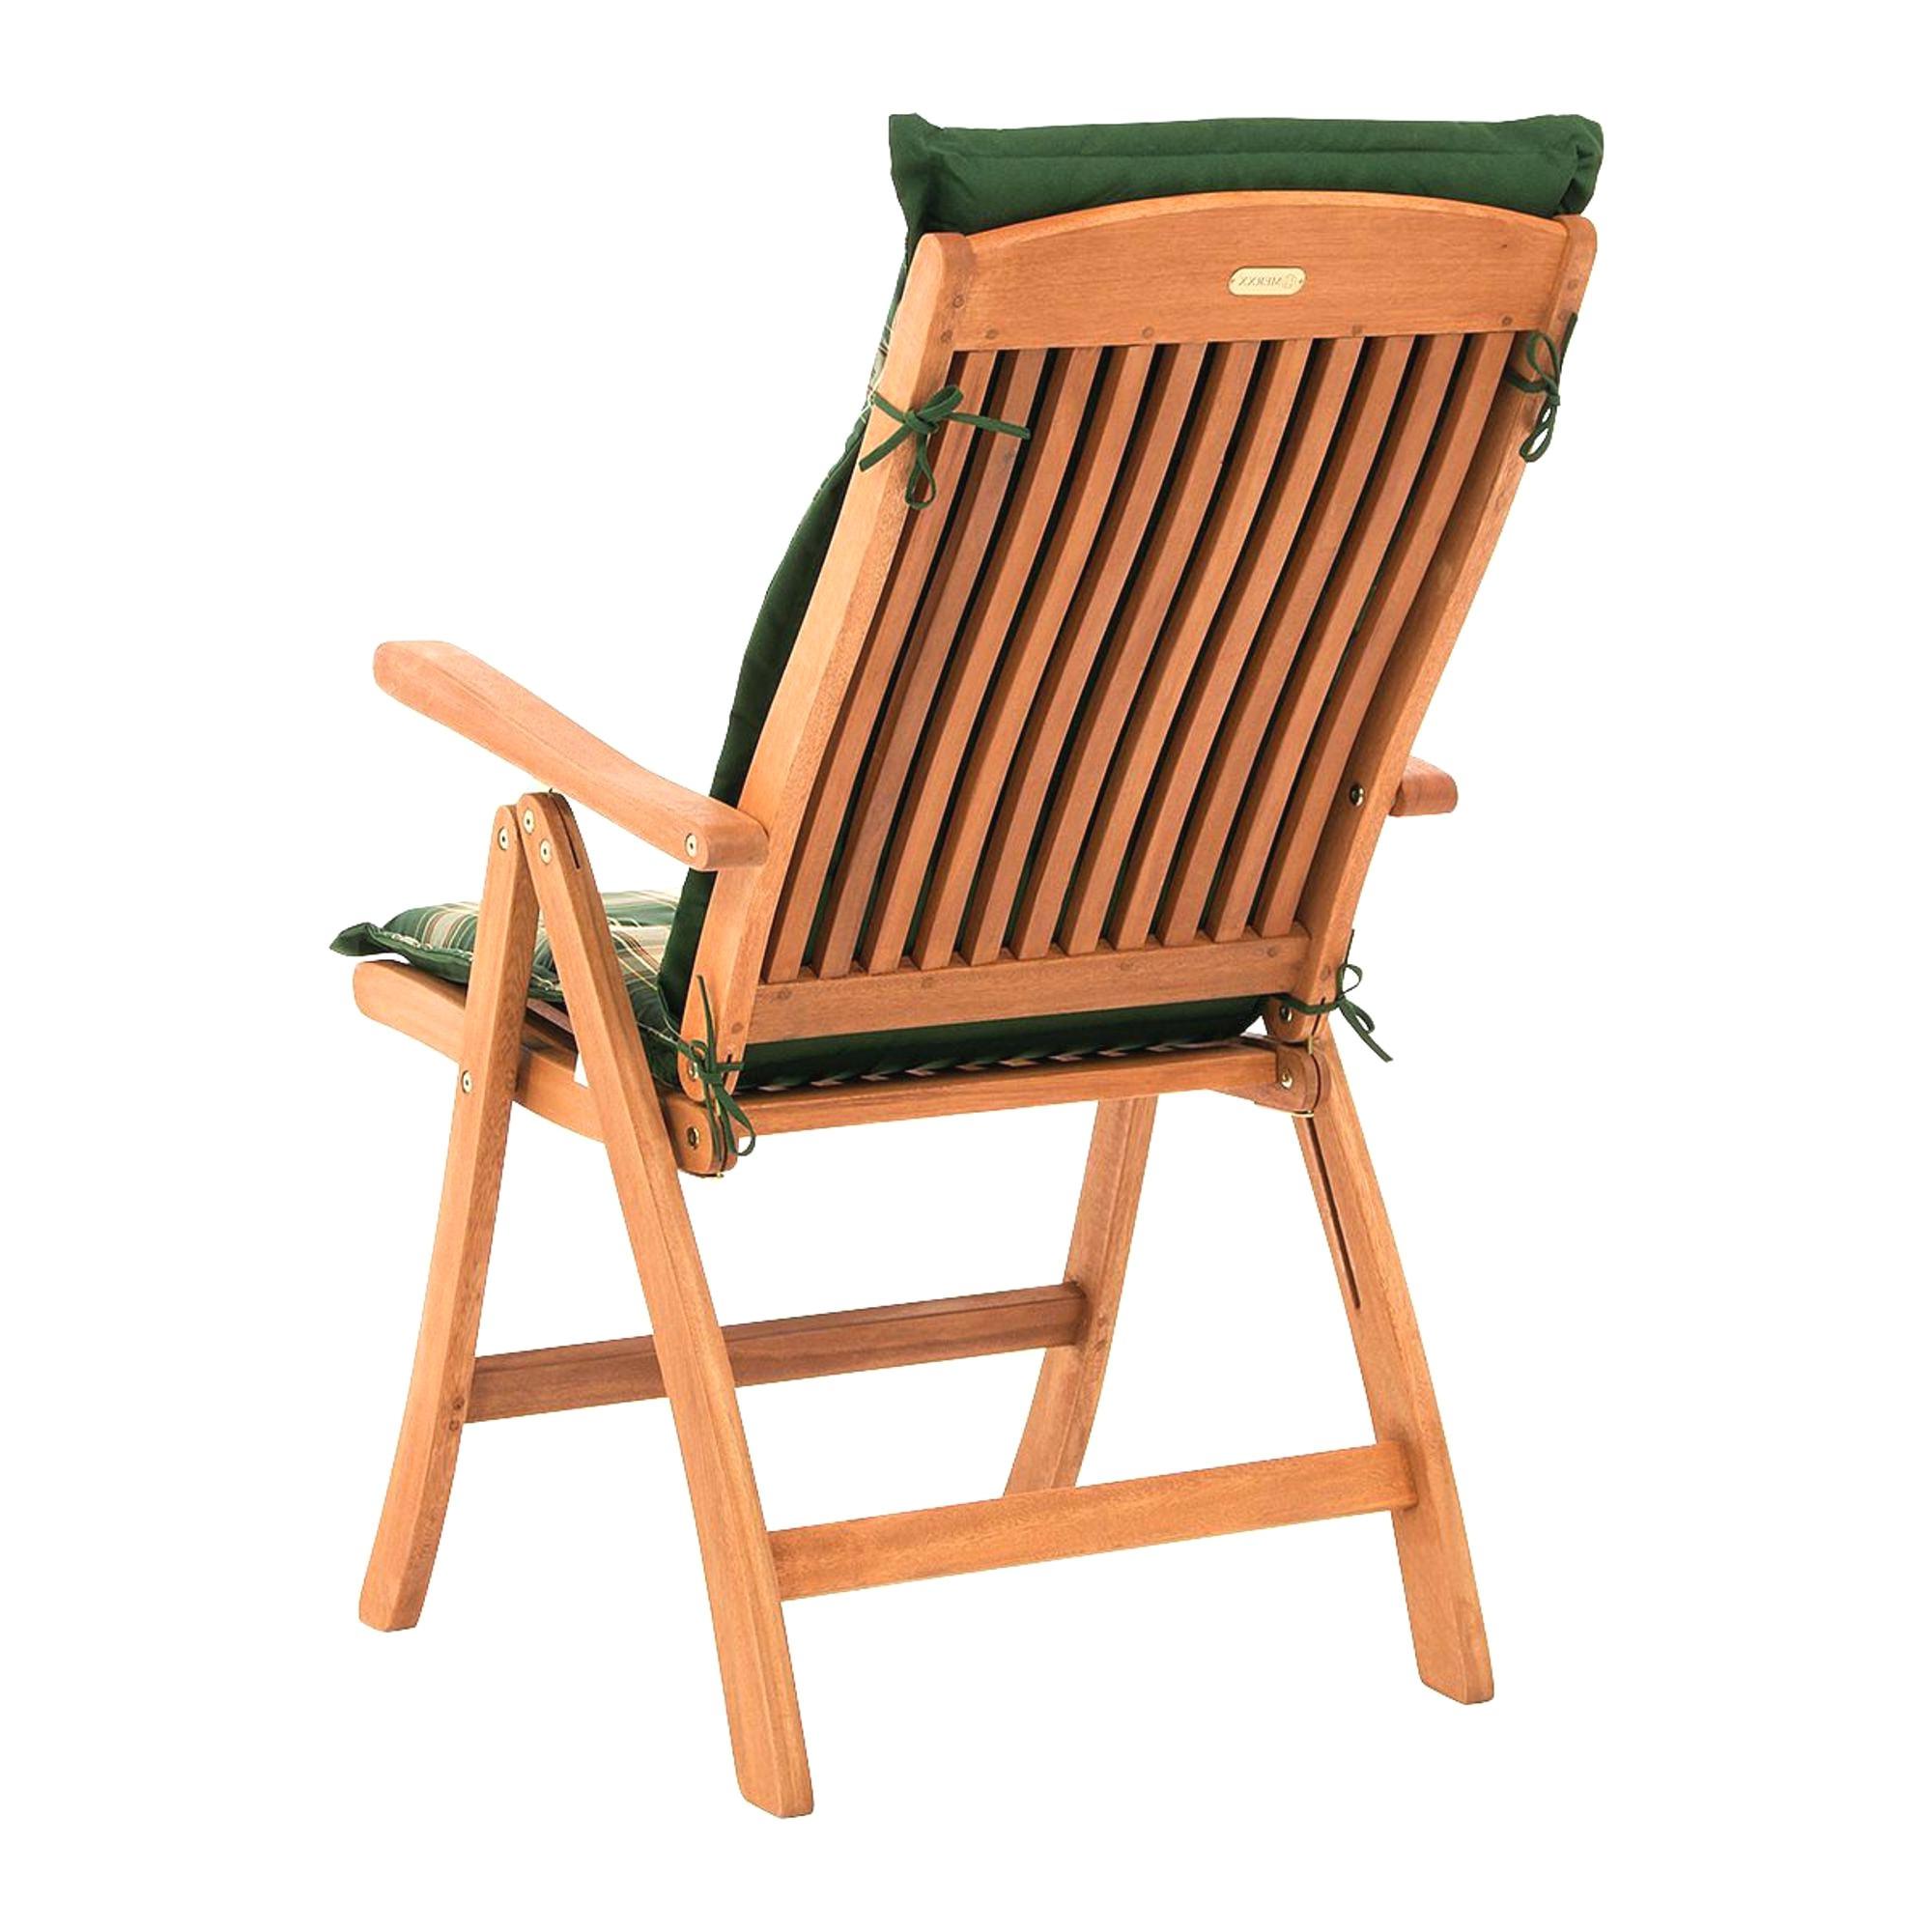 Full Size of Liegestuhl Holz Ikea Klappbar Stoff Garten Terrasse Sonnenliege Strandliege Aus Massivholz Regal Spielhaus Bad Unterschrank Esstisch Betten Naturholz Bett Wohnzimmer Liegestuhl Holz Ikea